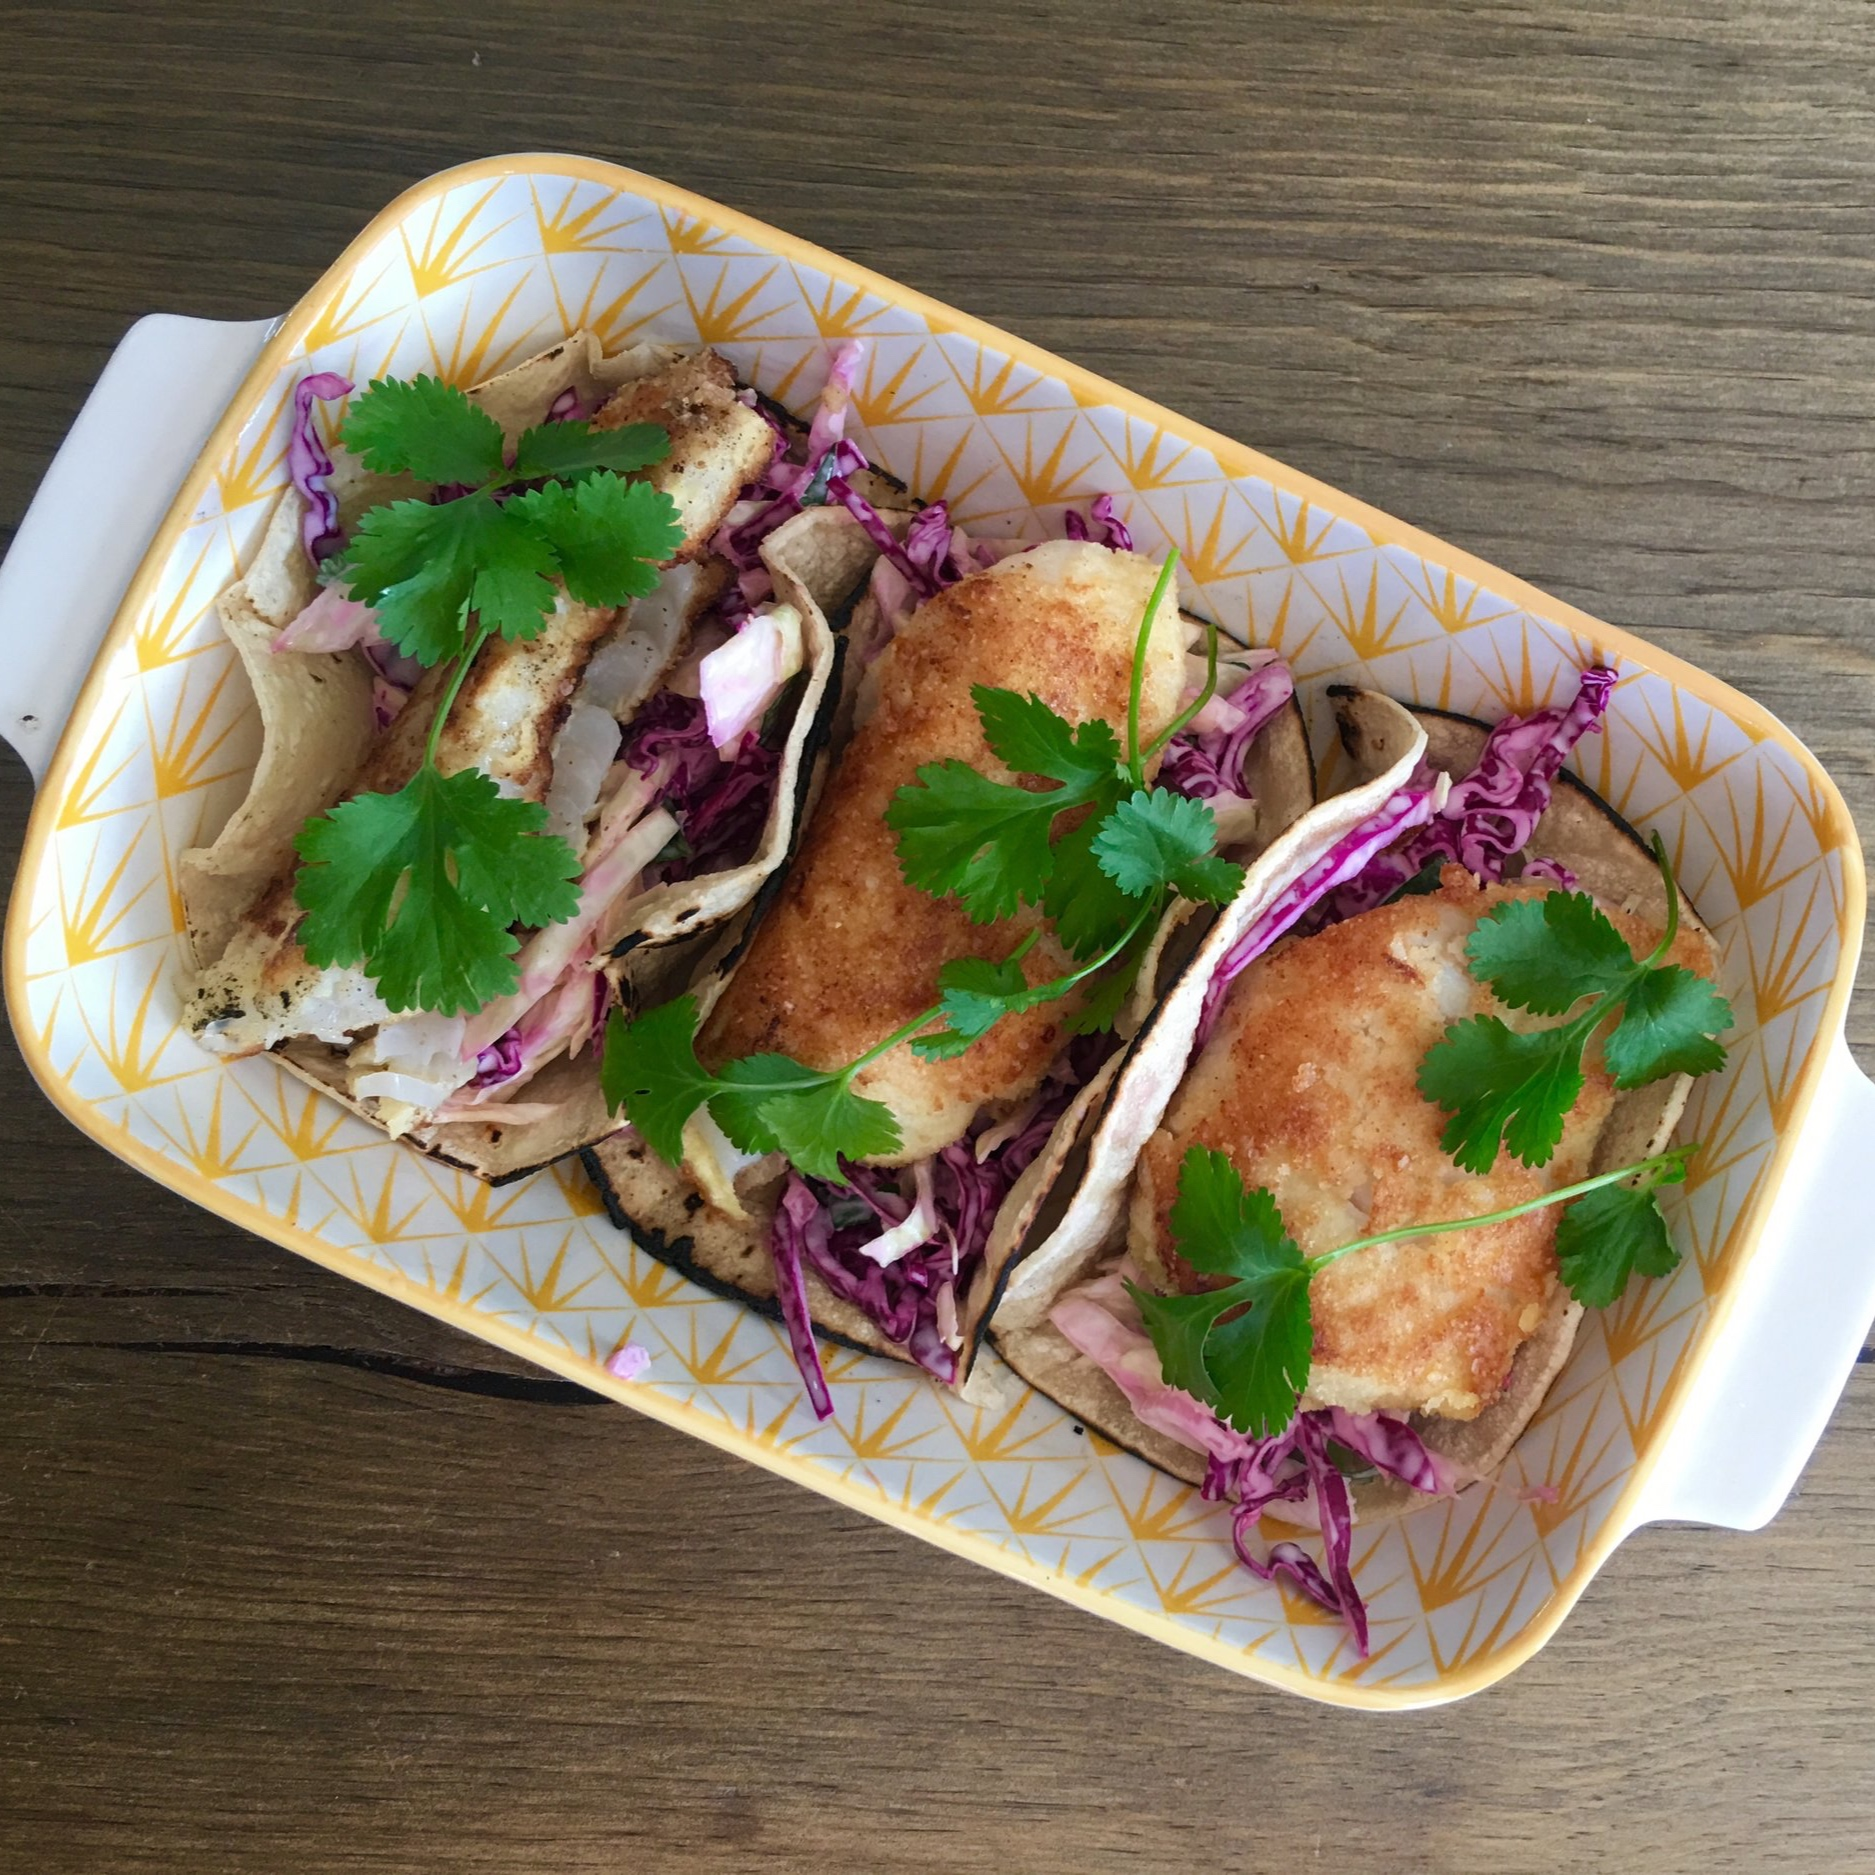 Fish+Tacos+and+Slawjpg.jpg